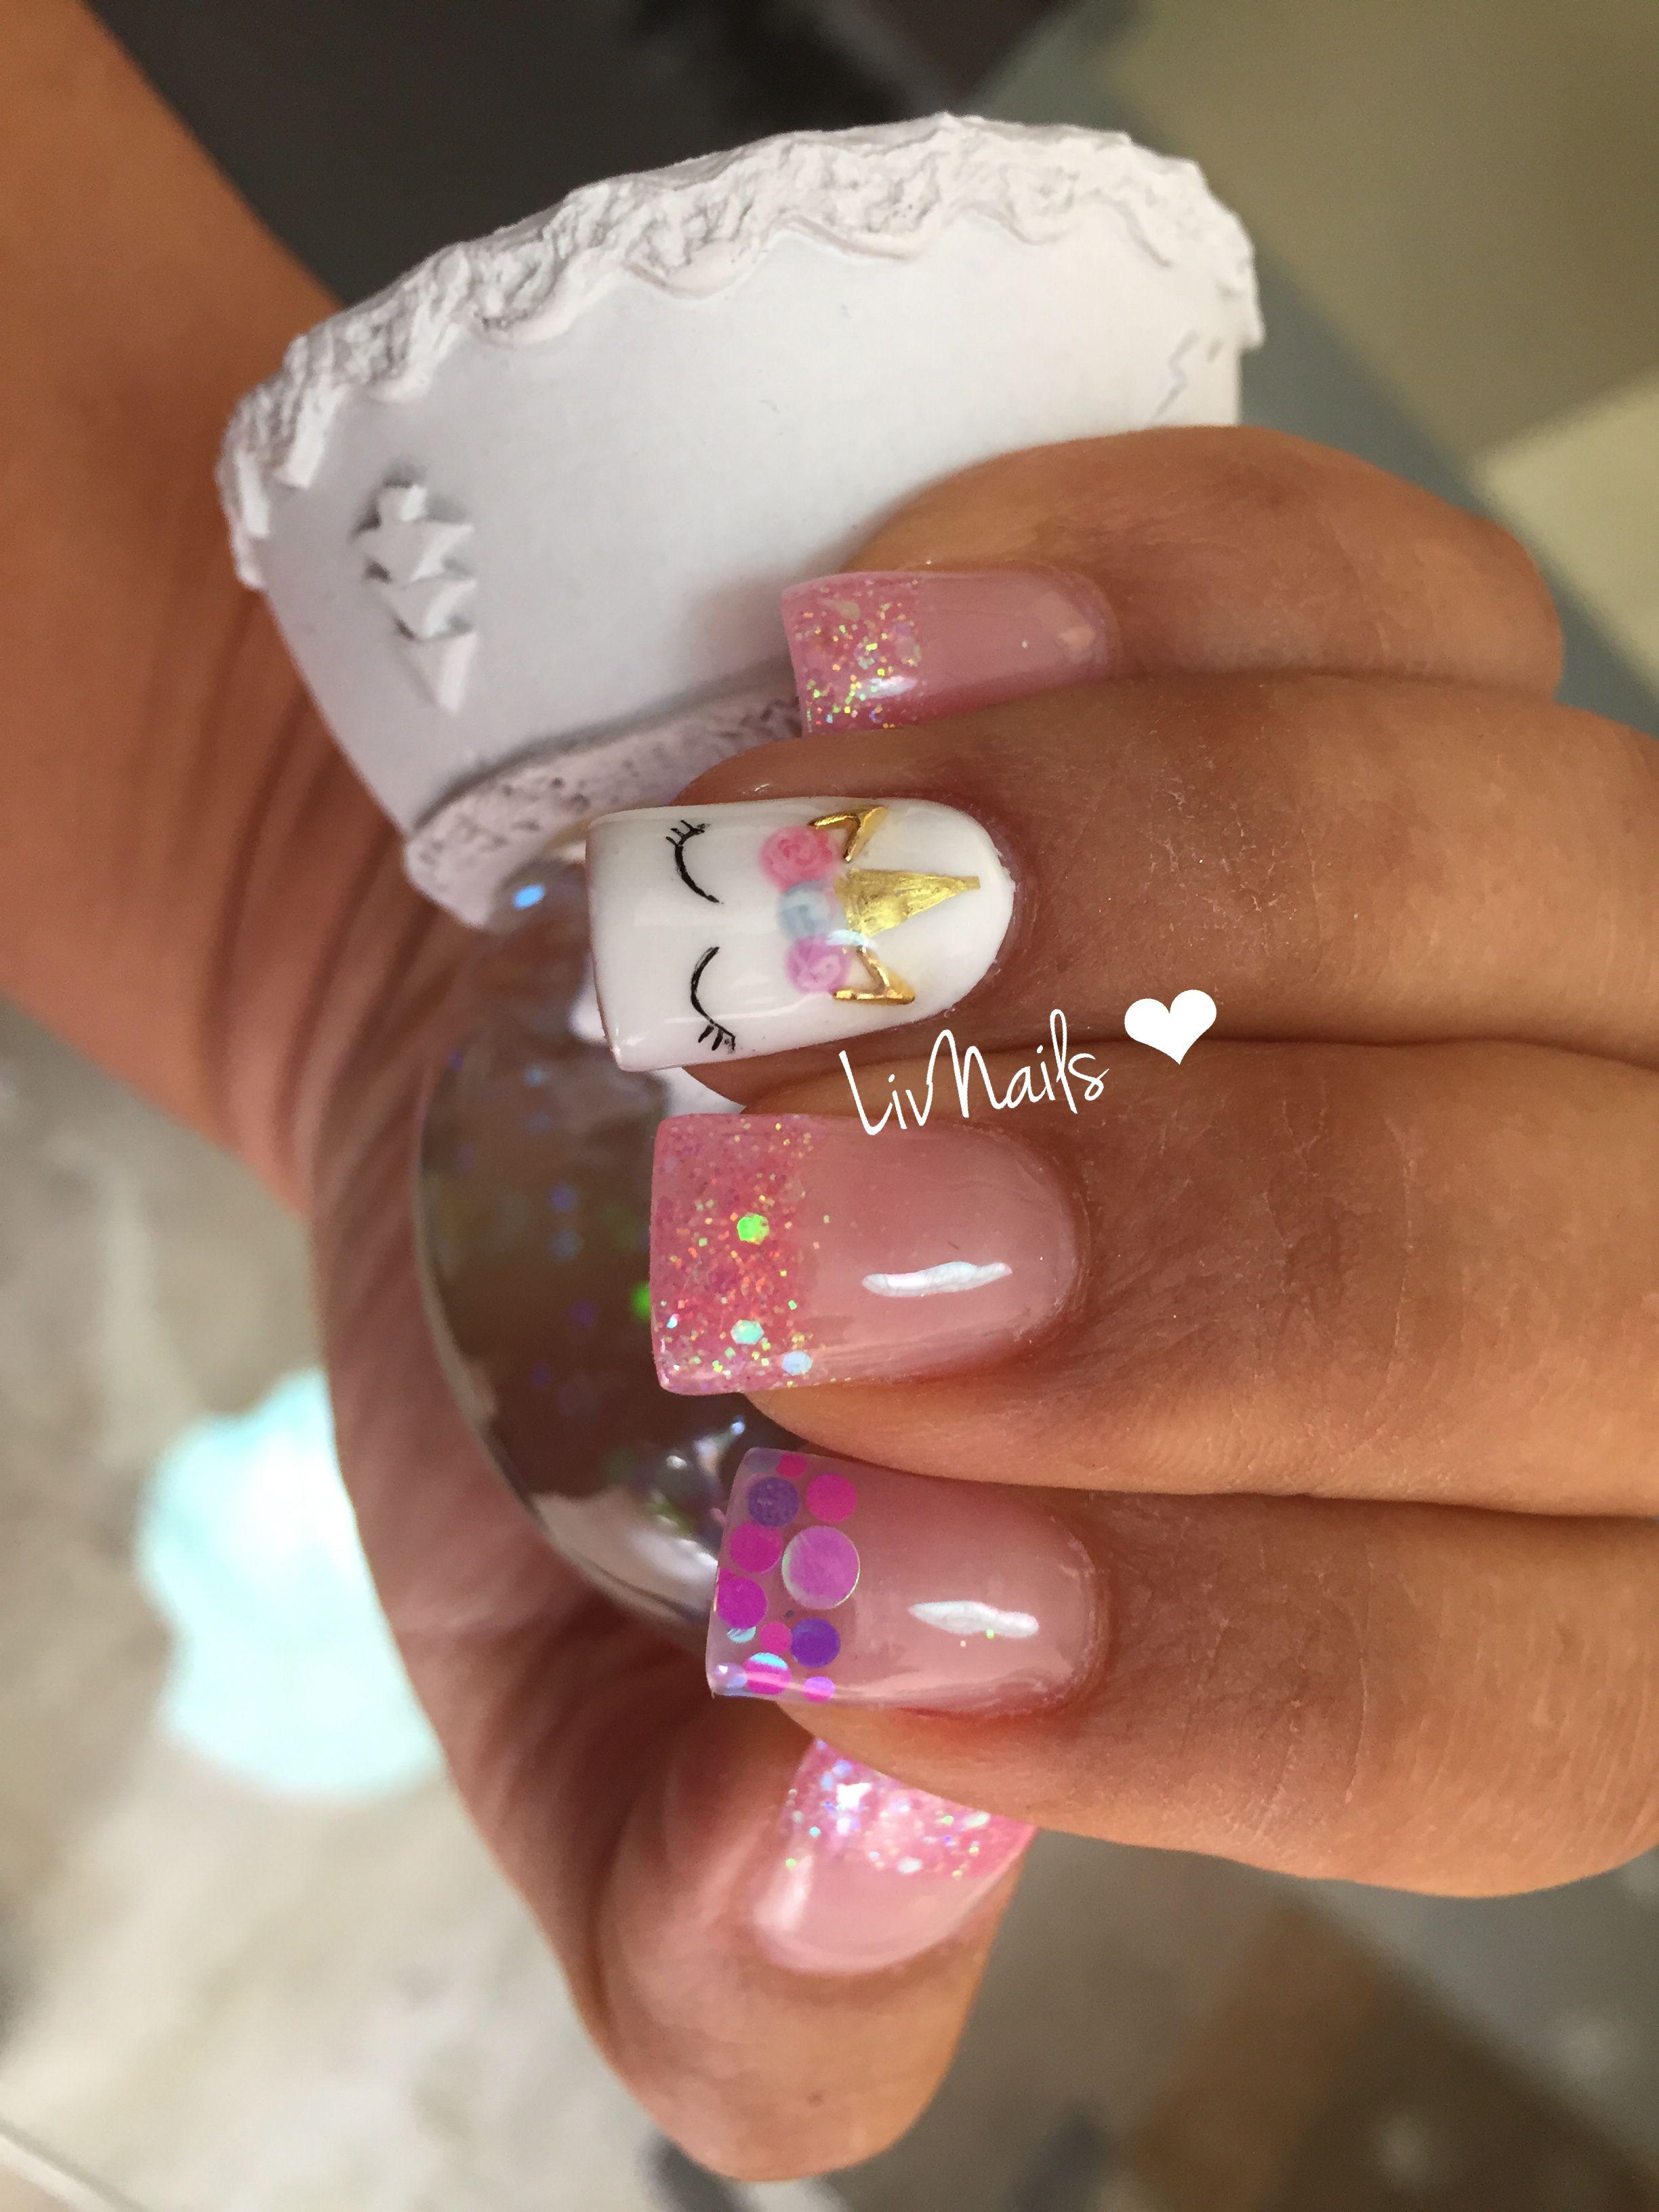 Uñas #Unicornio #confetti #Glitters #LivNails | Arte uñas ...